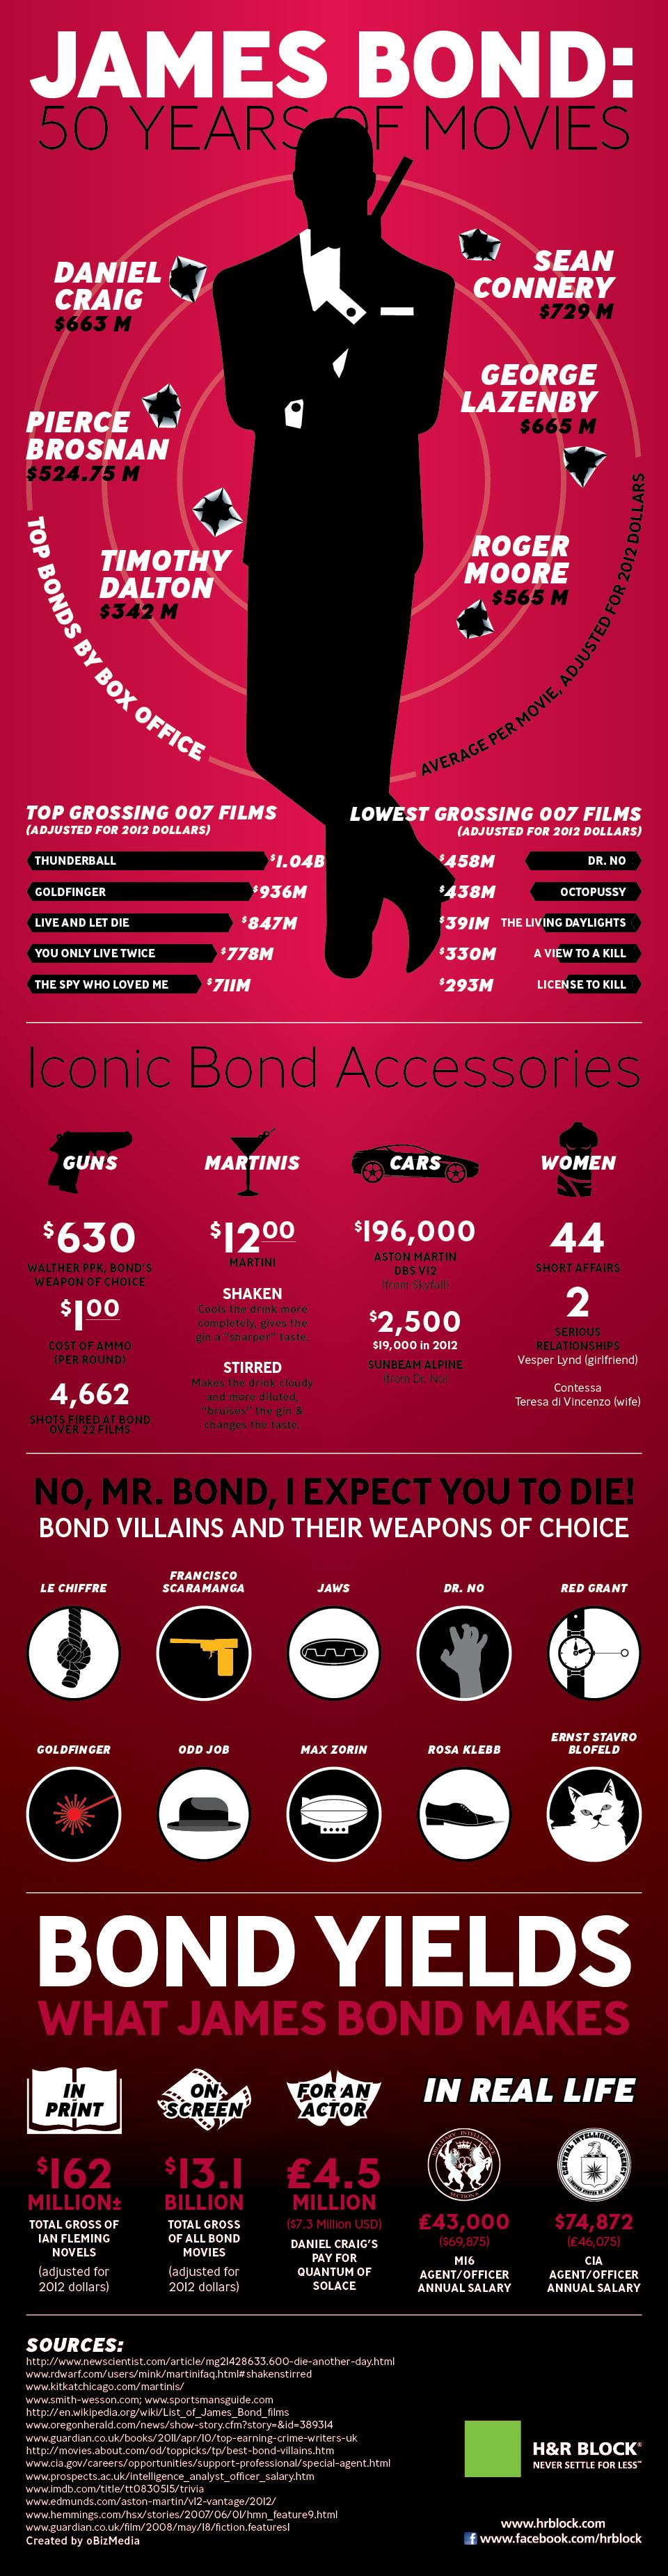 5. James Bond  50 years of Movies